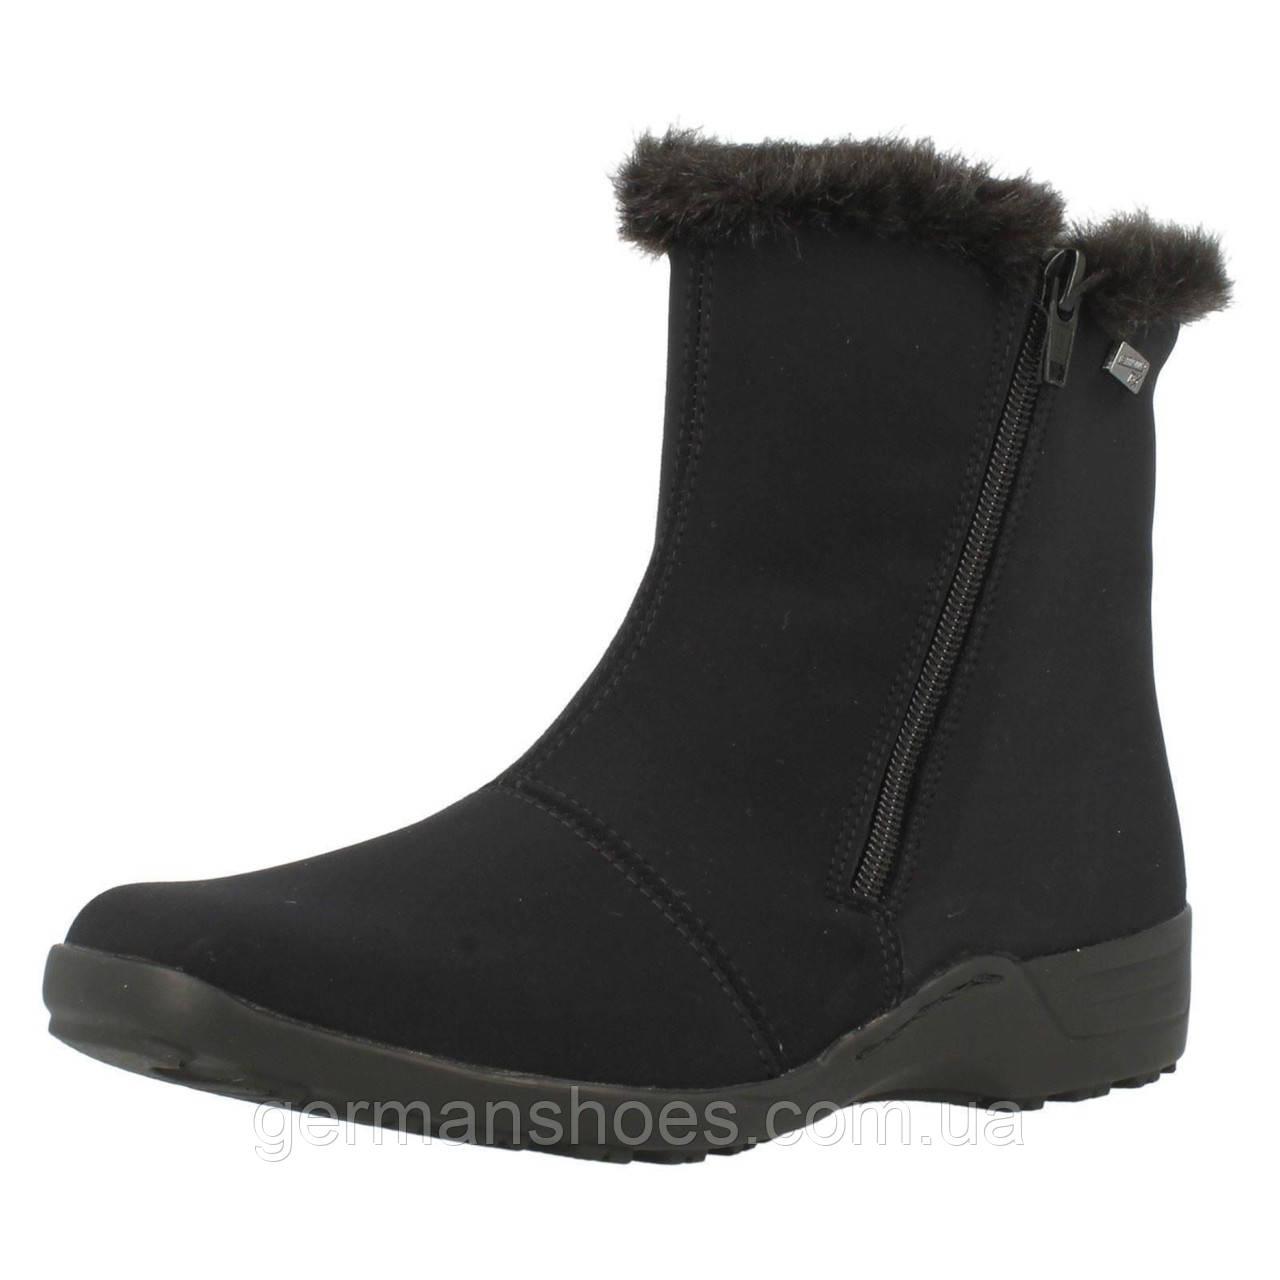 Ботинки женские Remonte D0579-01